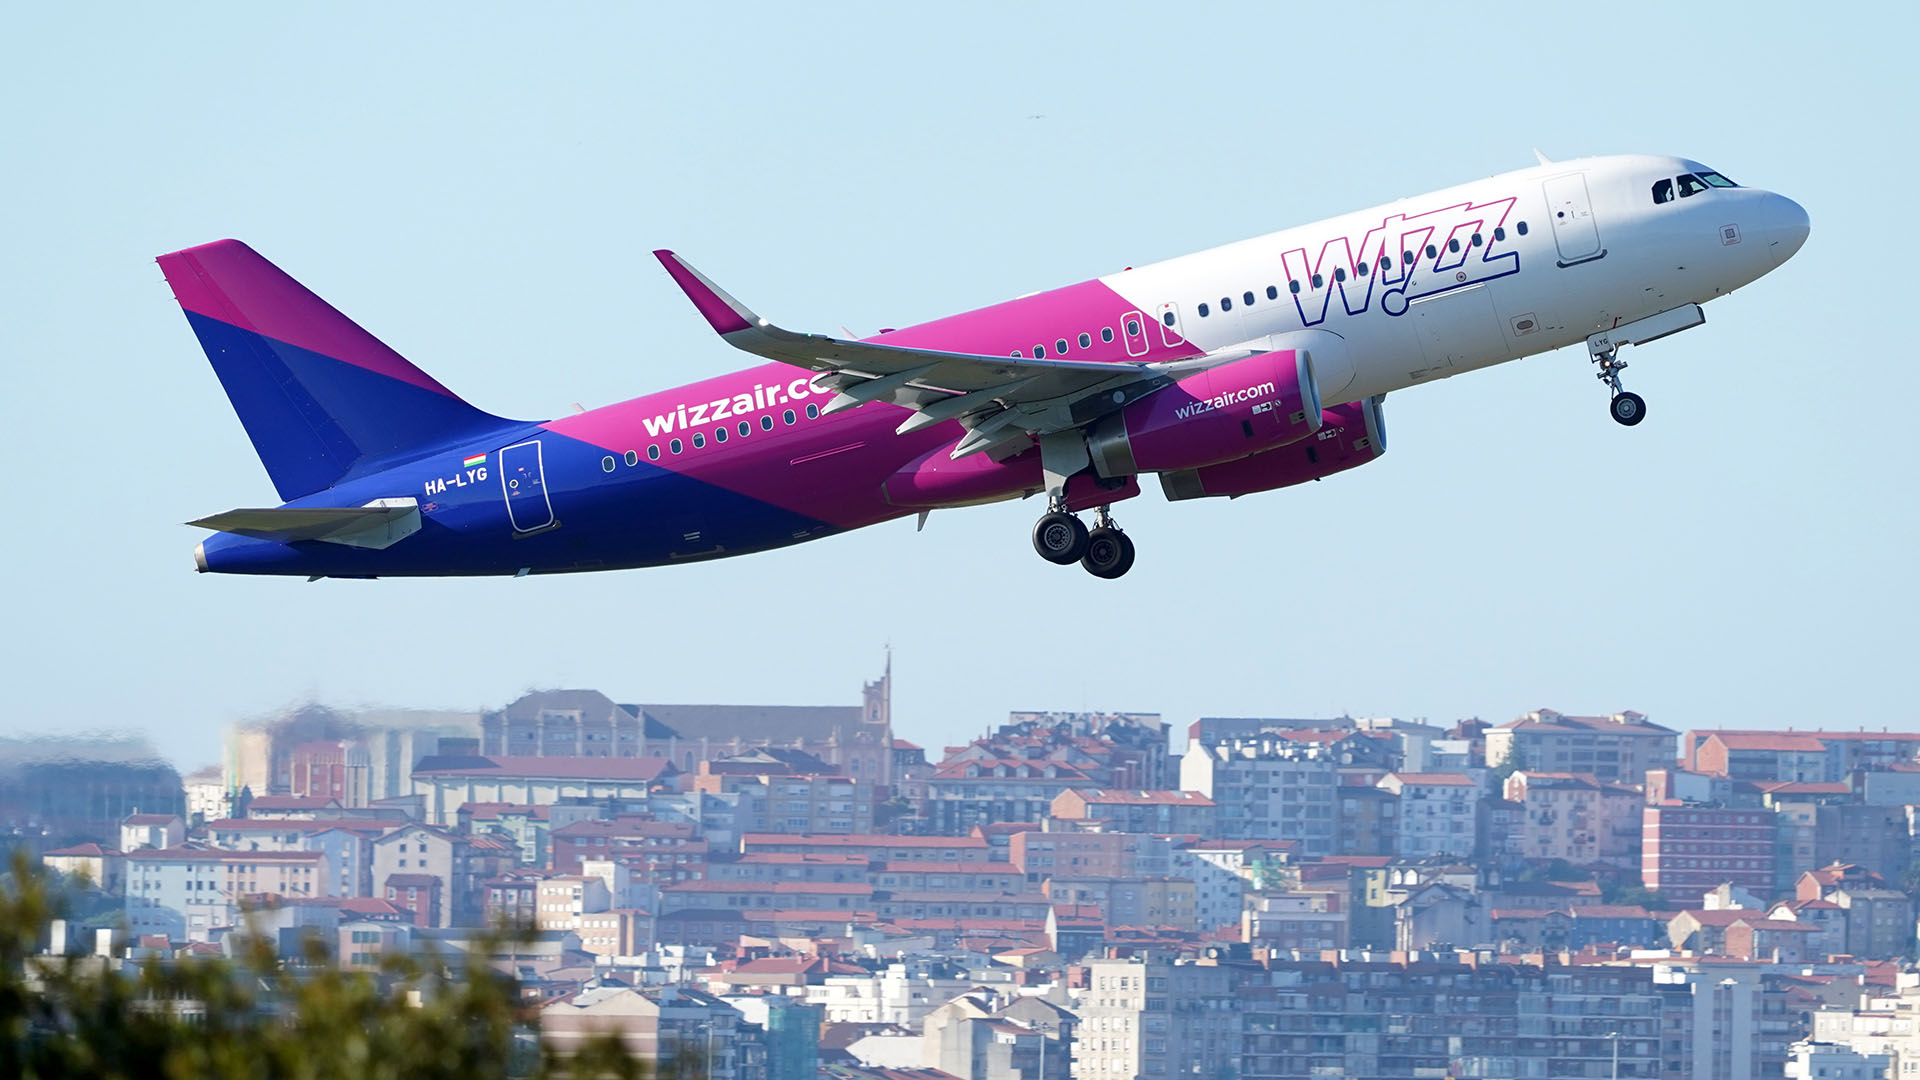 Már 10 görög úti cél a Wizz Air kínálatában